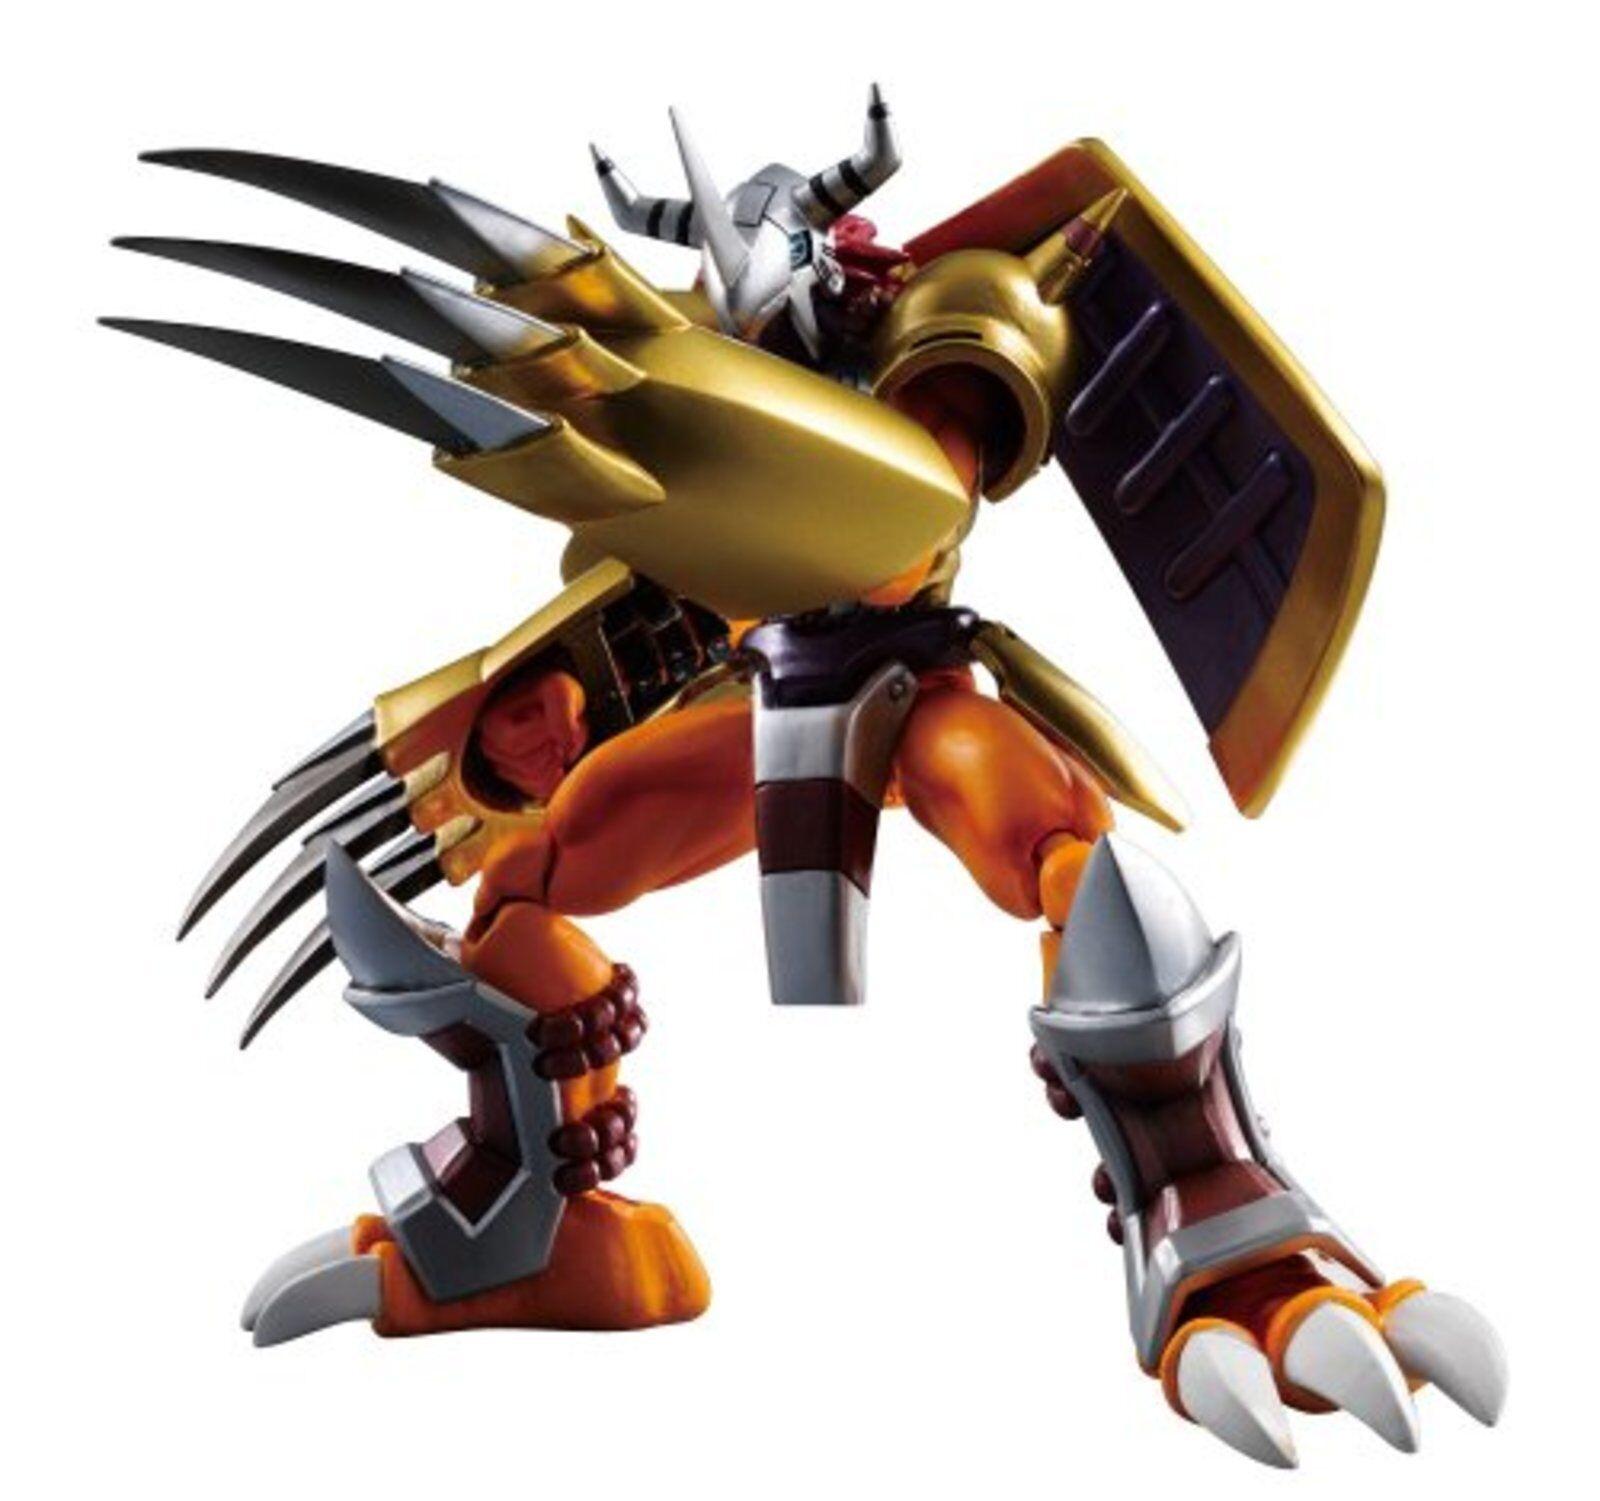 Digital Monstruos Digimon D-Arts Wargrismon Figura en Caja F S con   Tracking